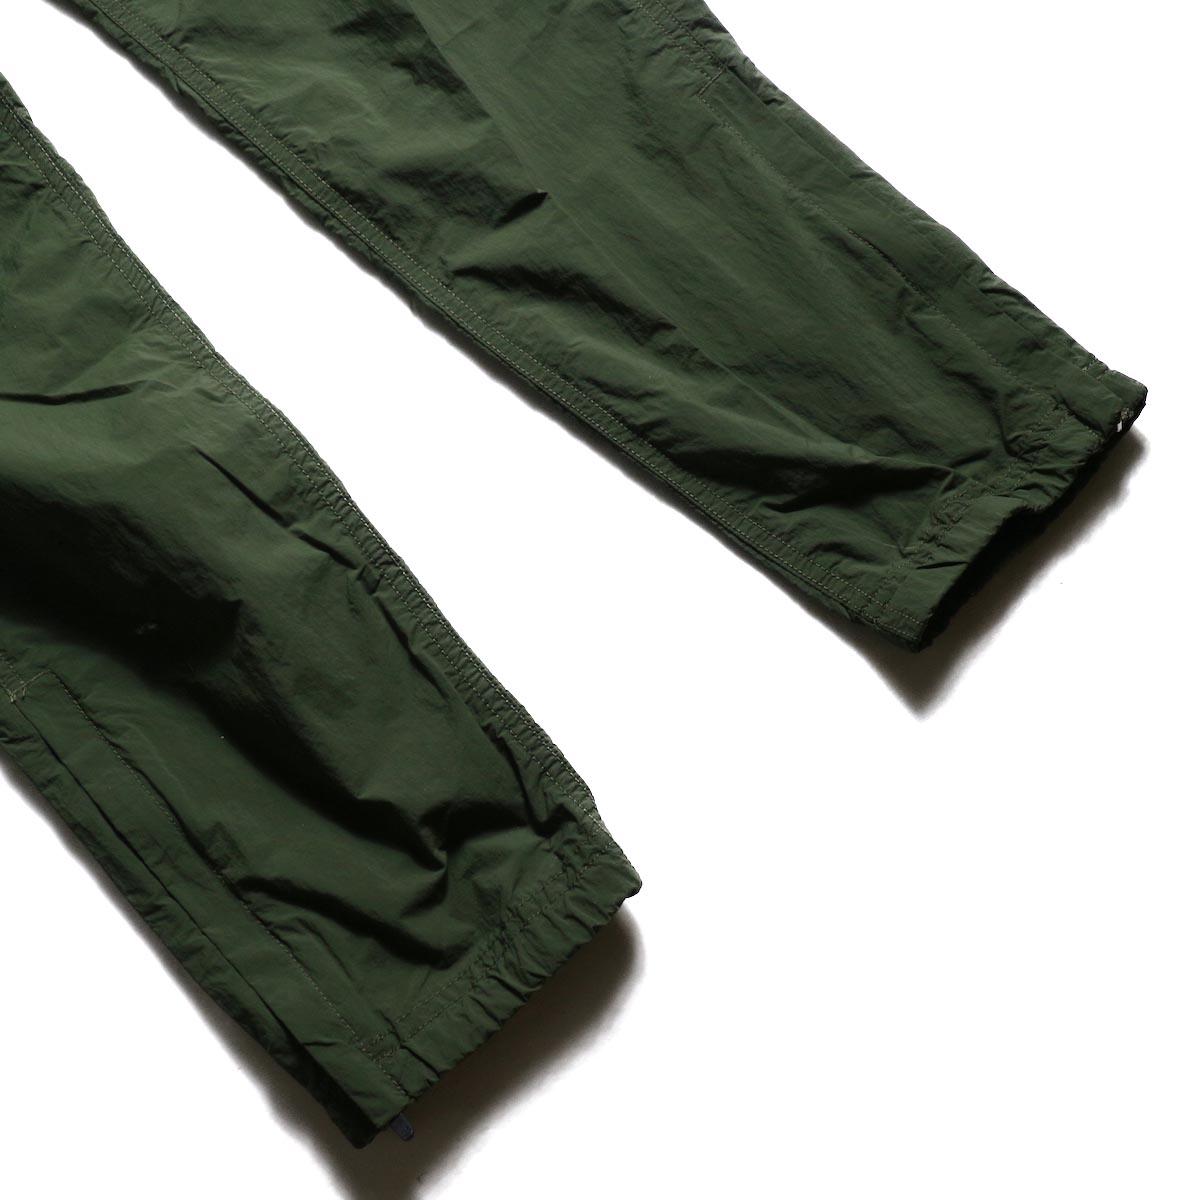 GRAMICCI / Packable Truck Pants (Olive) 裾